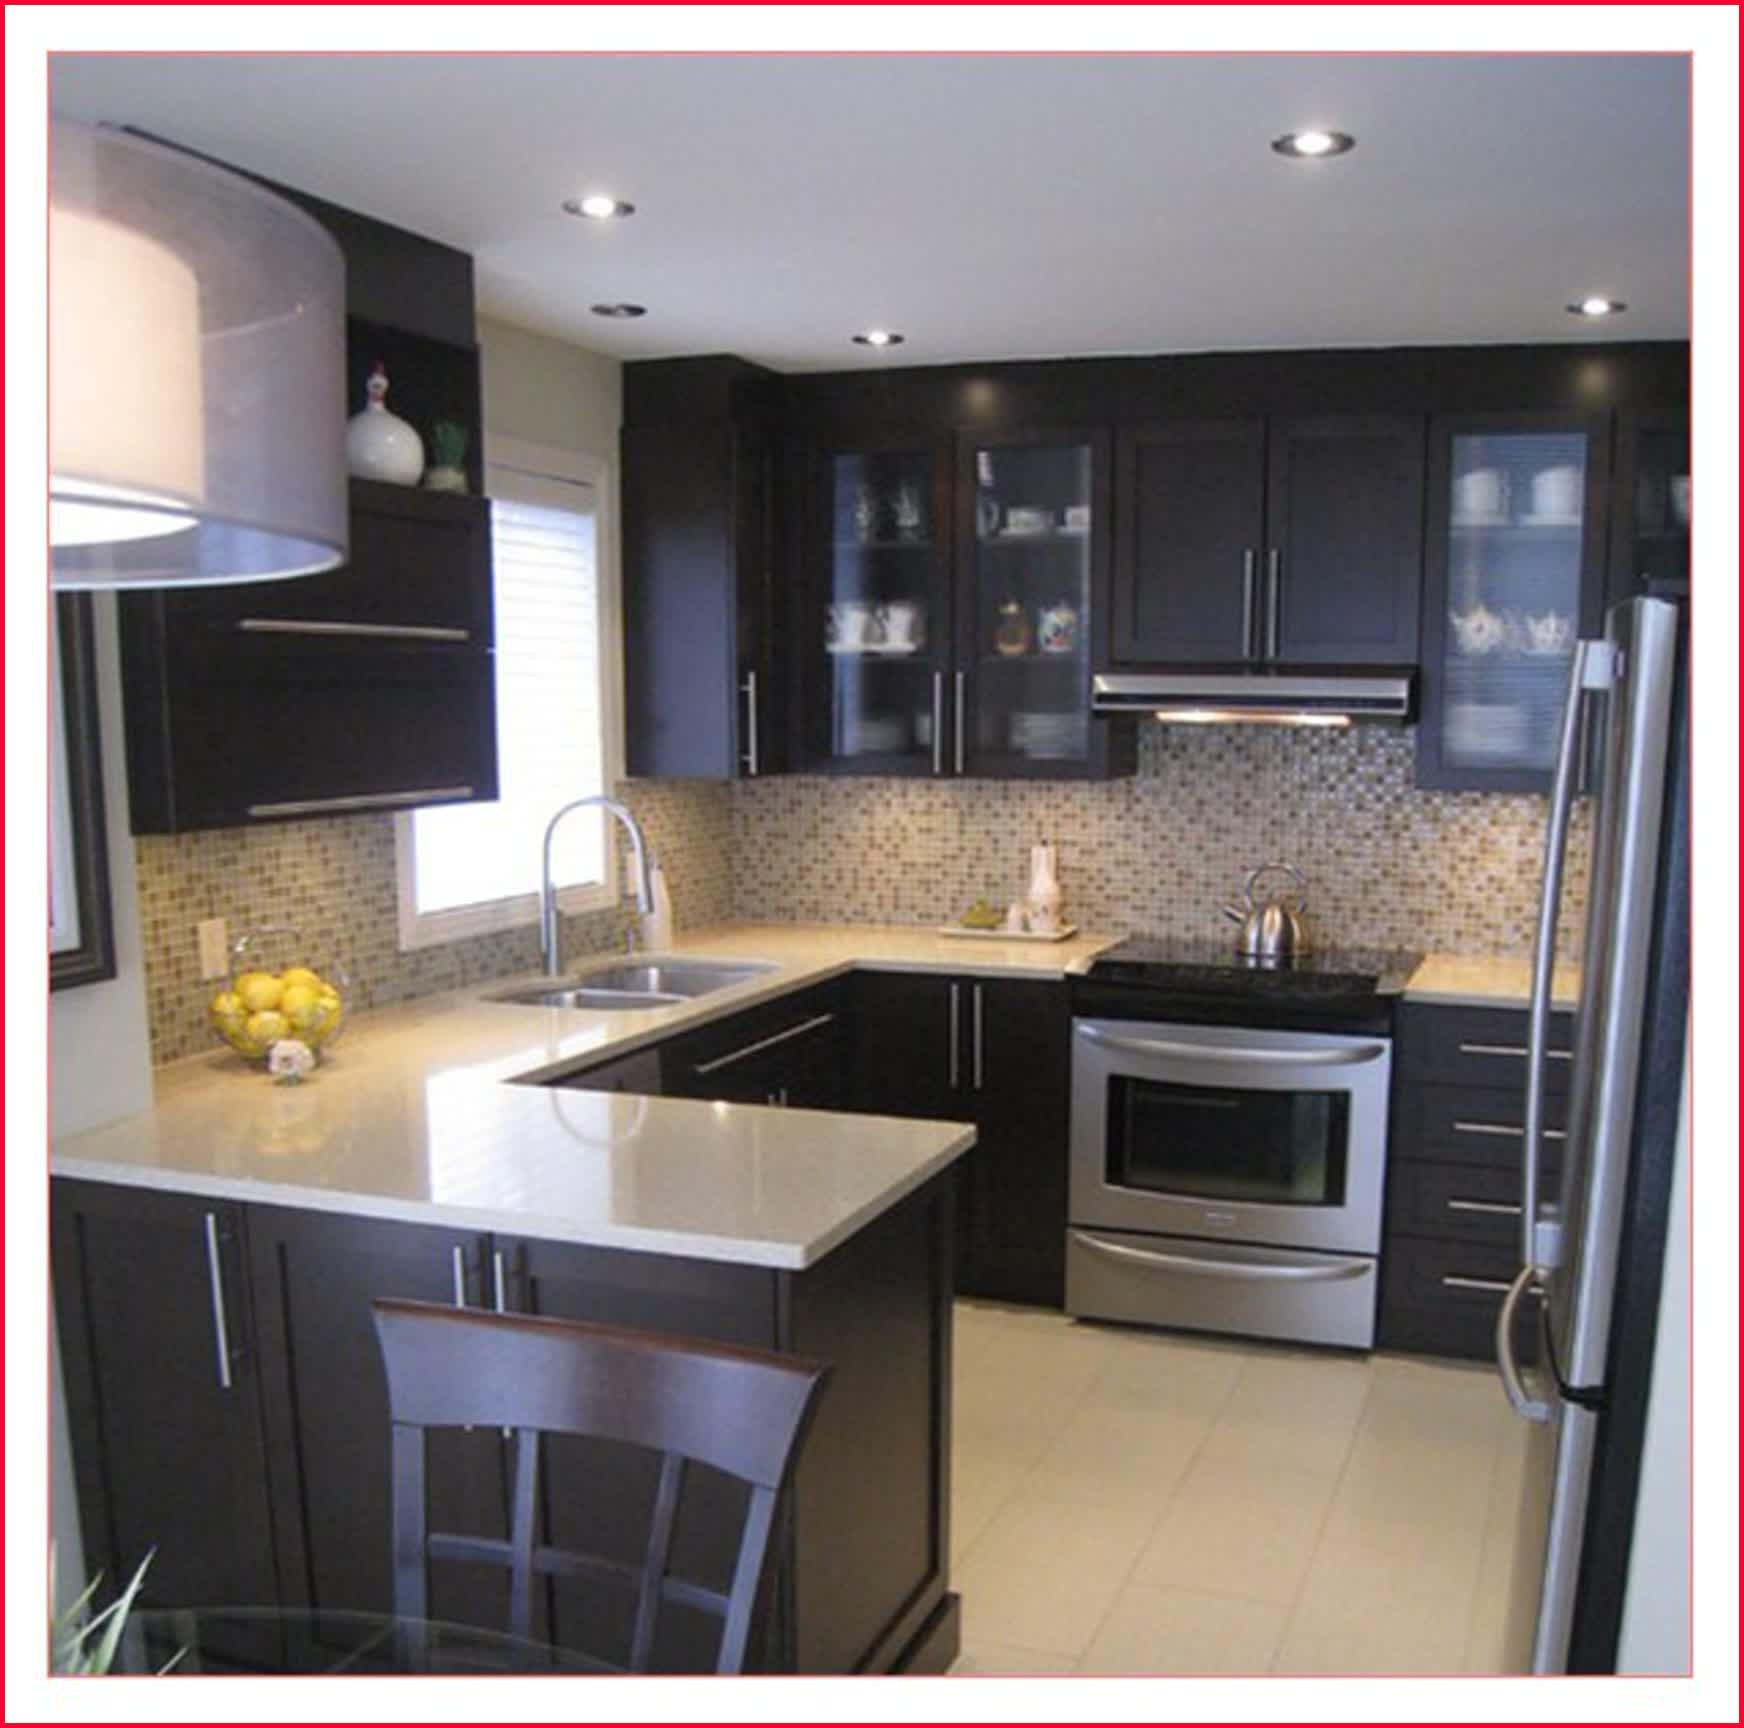 Programa Diseño Muebles 3d Gratis Kvdd Diseà O Cocina 3d Muebles De Cocina DiseO DiseO De Cocina